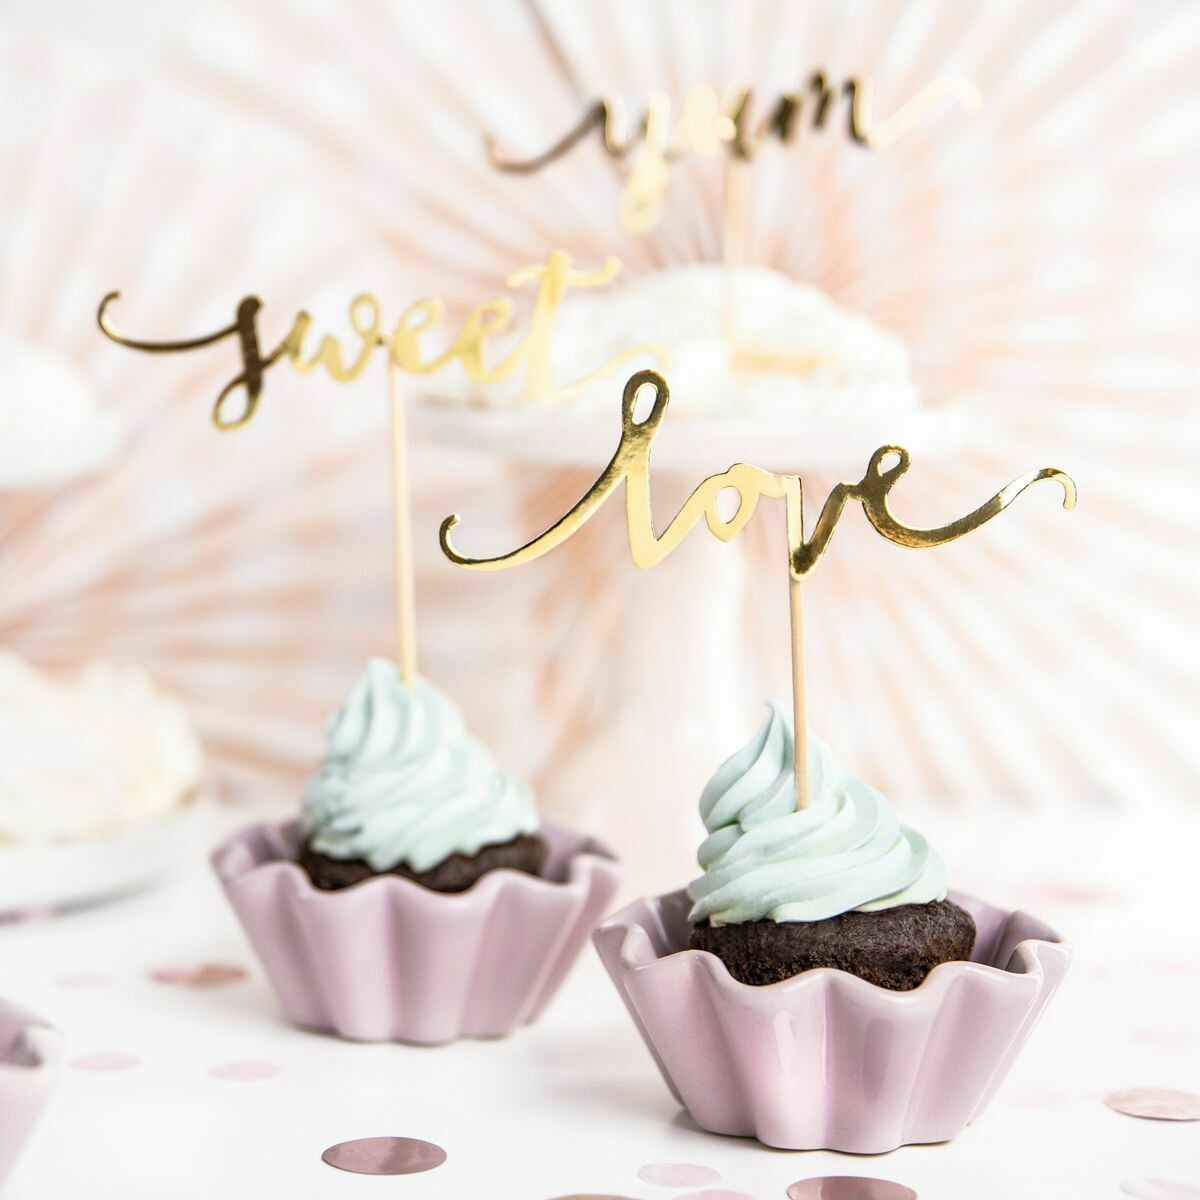 PartyDeco Cupcake Toppers -Love, Sweet & Yum' -GOLD - Σετ 6τεμ Τόπερ Χρυσά